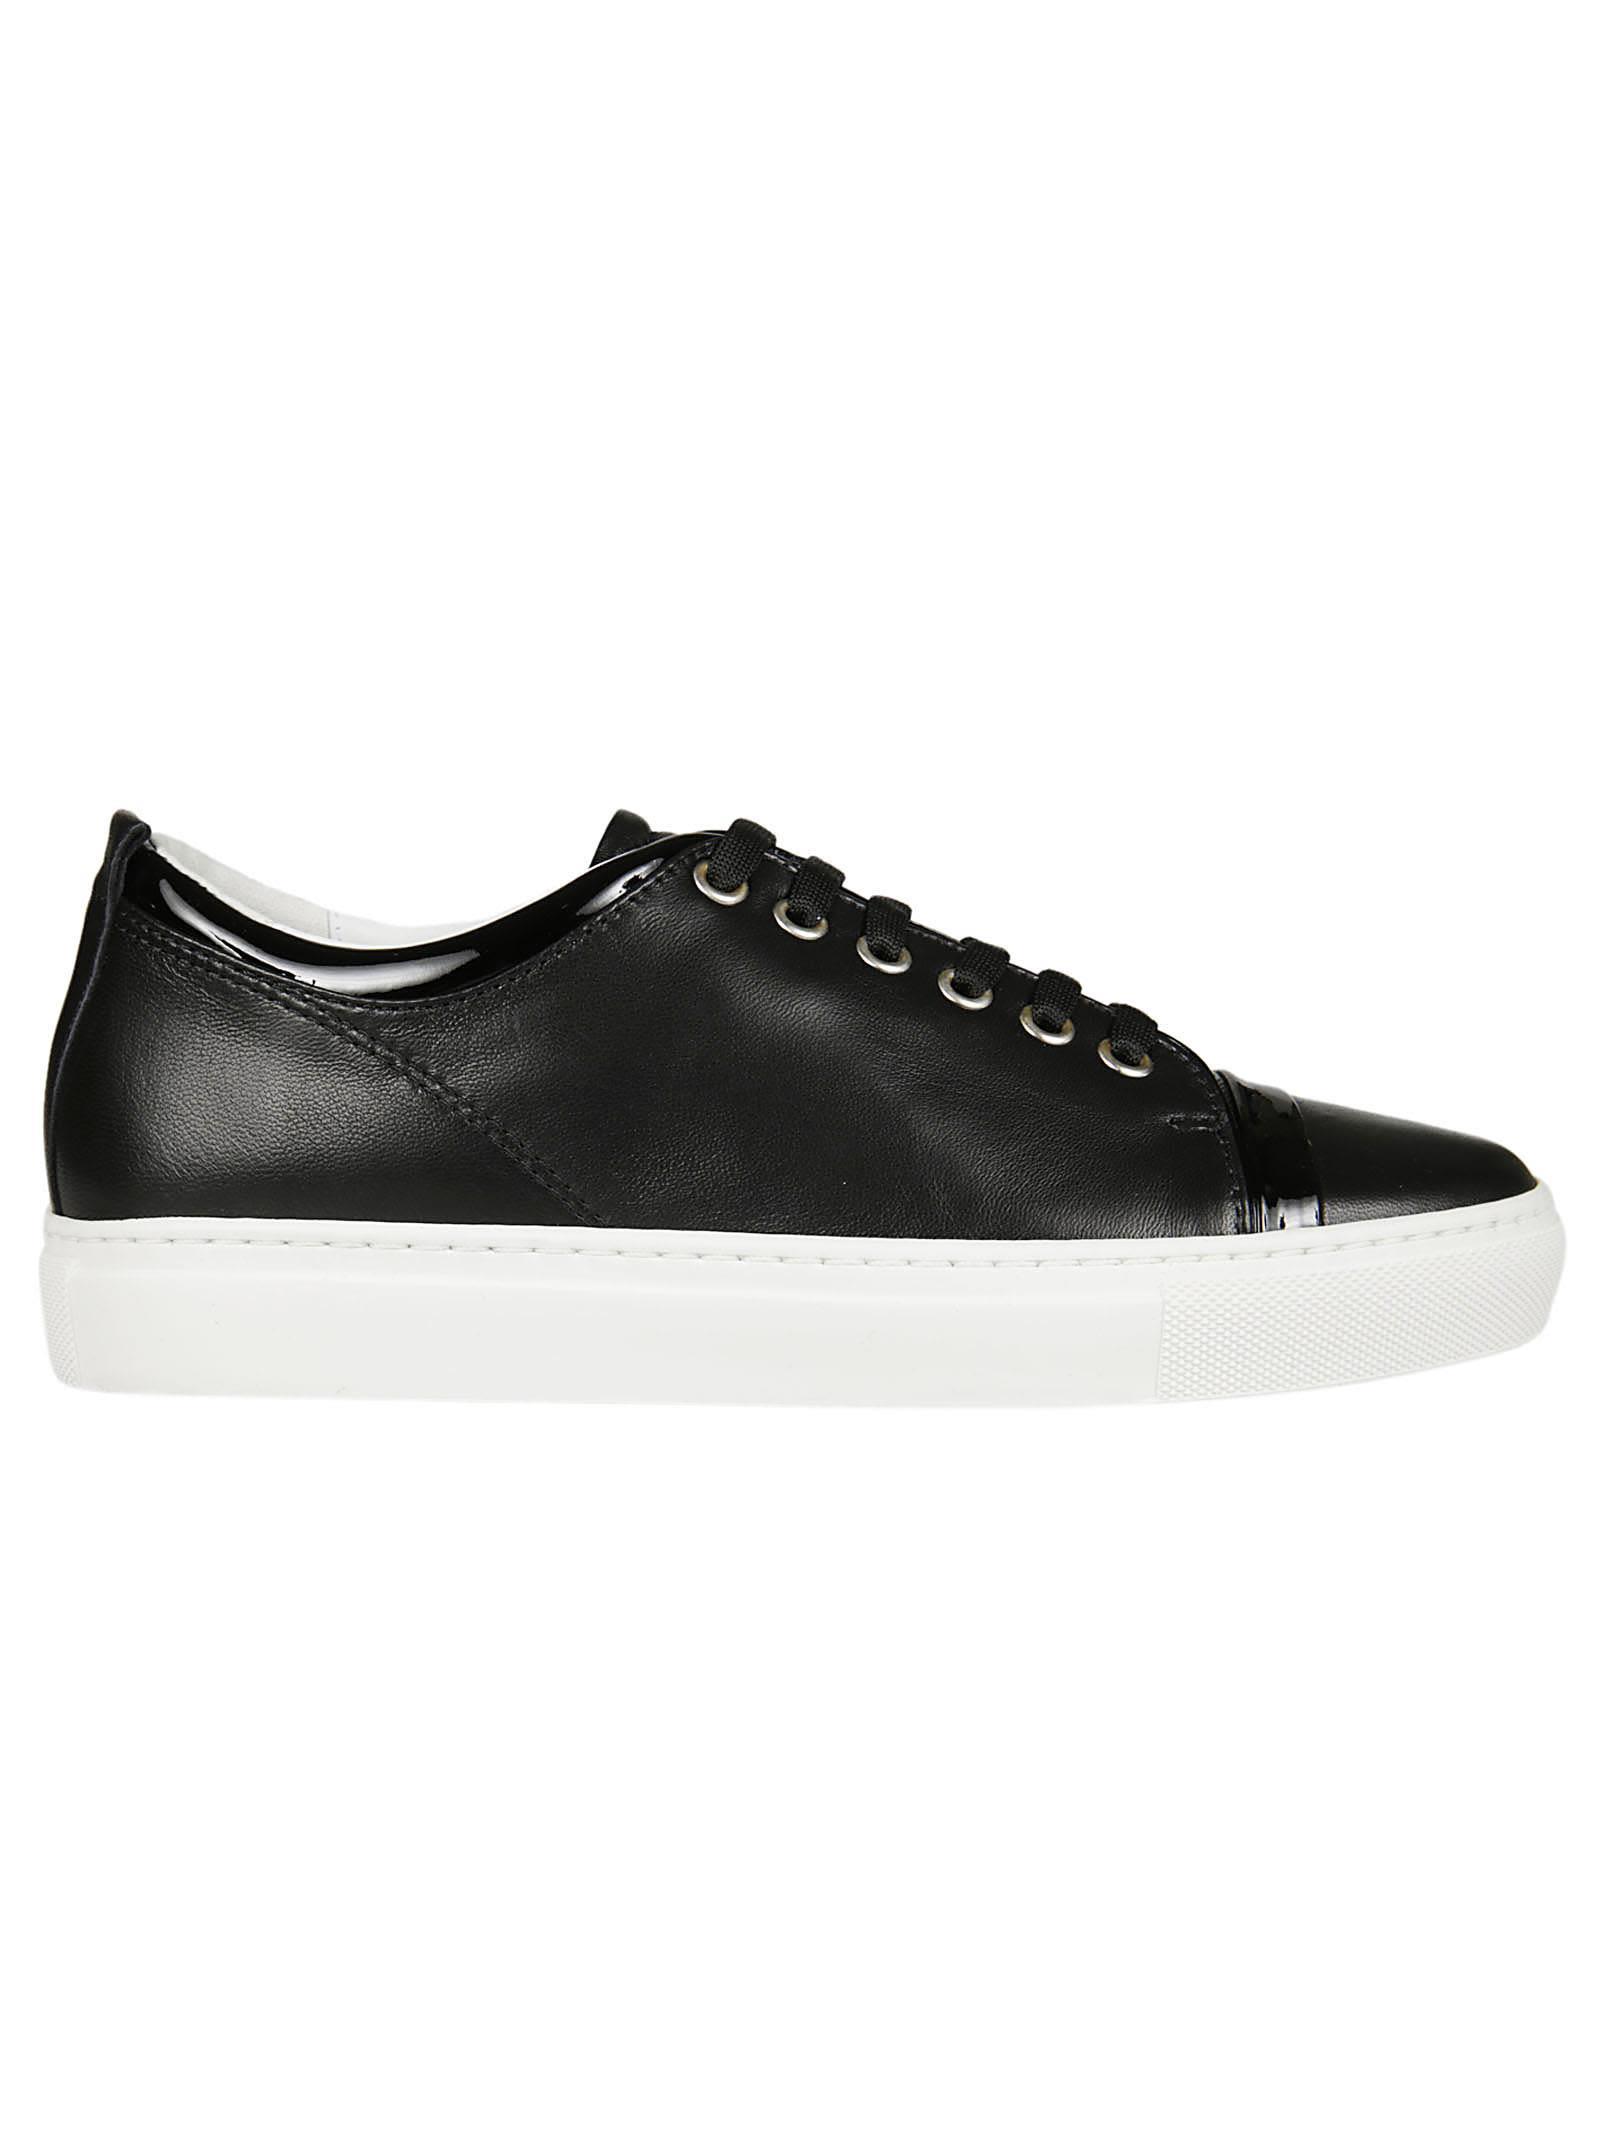 Lanvin - Lanvin Classic Sneakers - Nero, Women's Sneakers | Italist